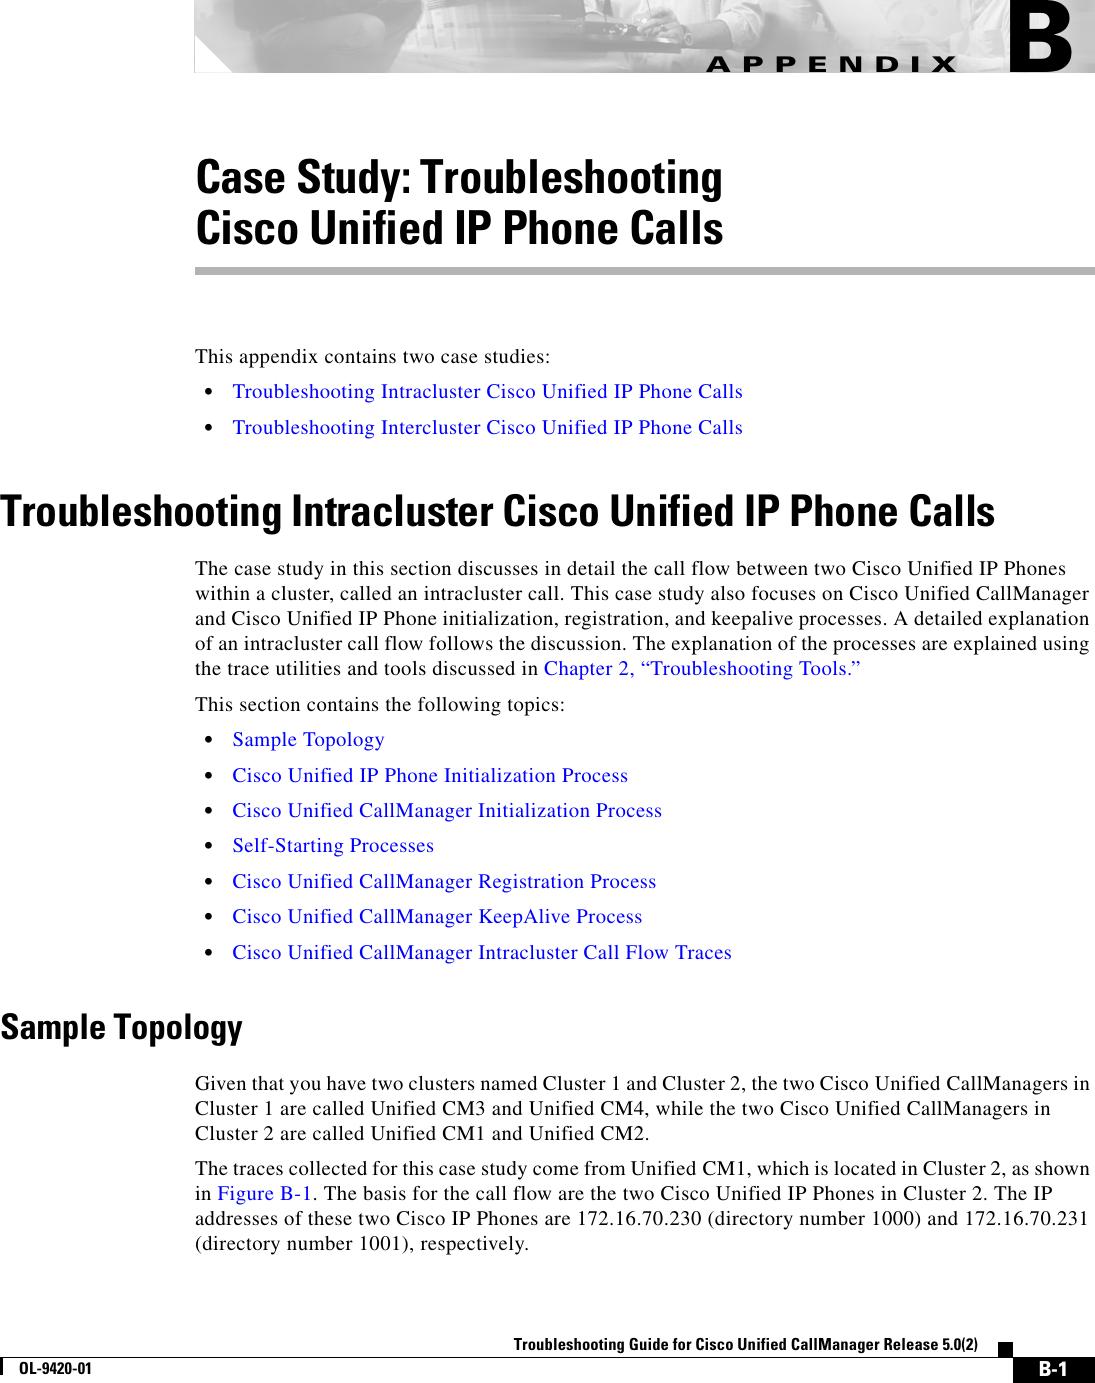 Cisco Systems Ol 9420 01 Users Manual Tb502b mif